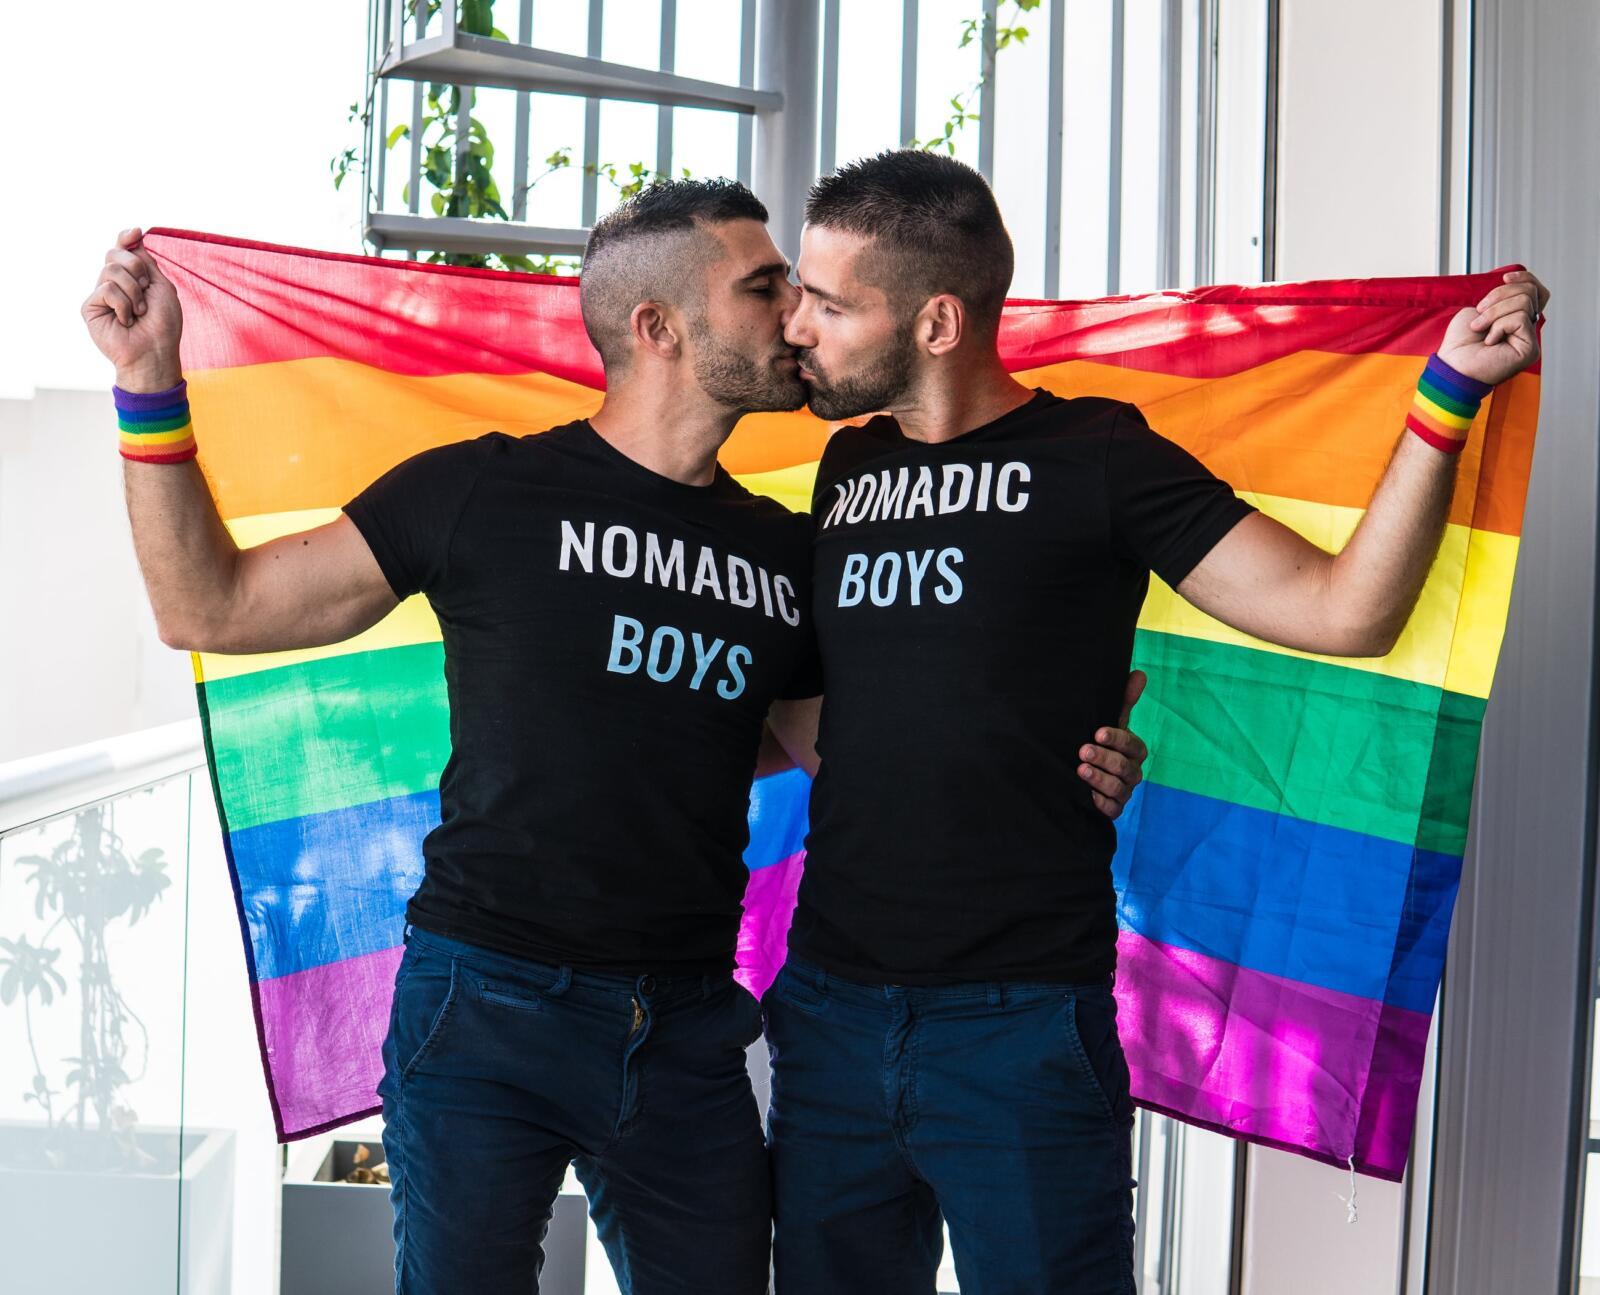 Nomadic Boys rainbow flag at Cyprus Pride in Nicosia